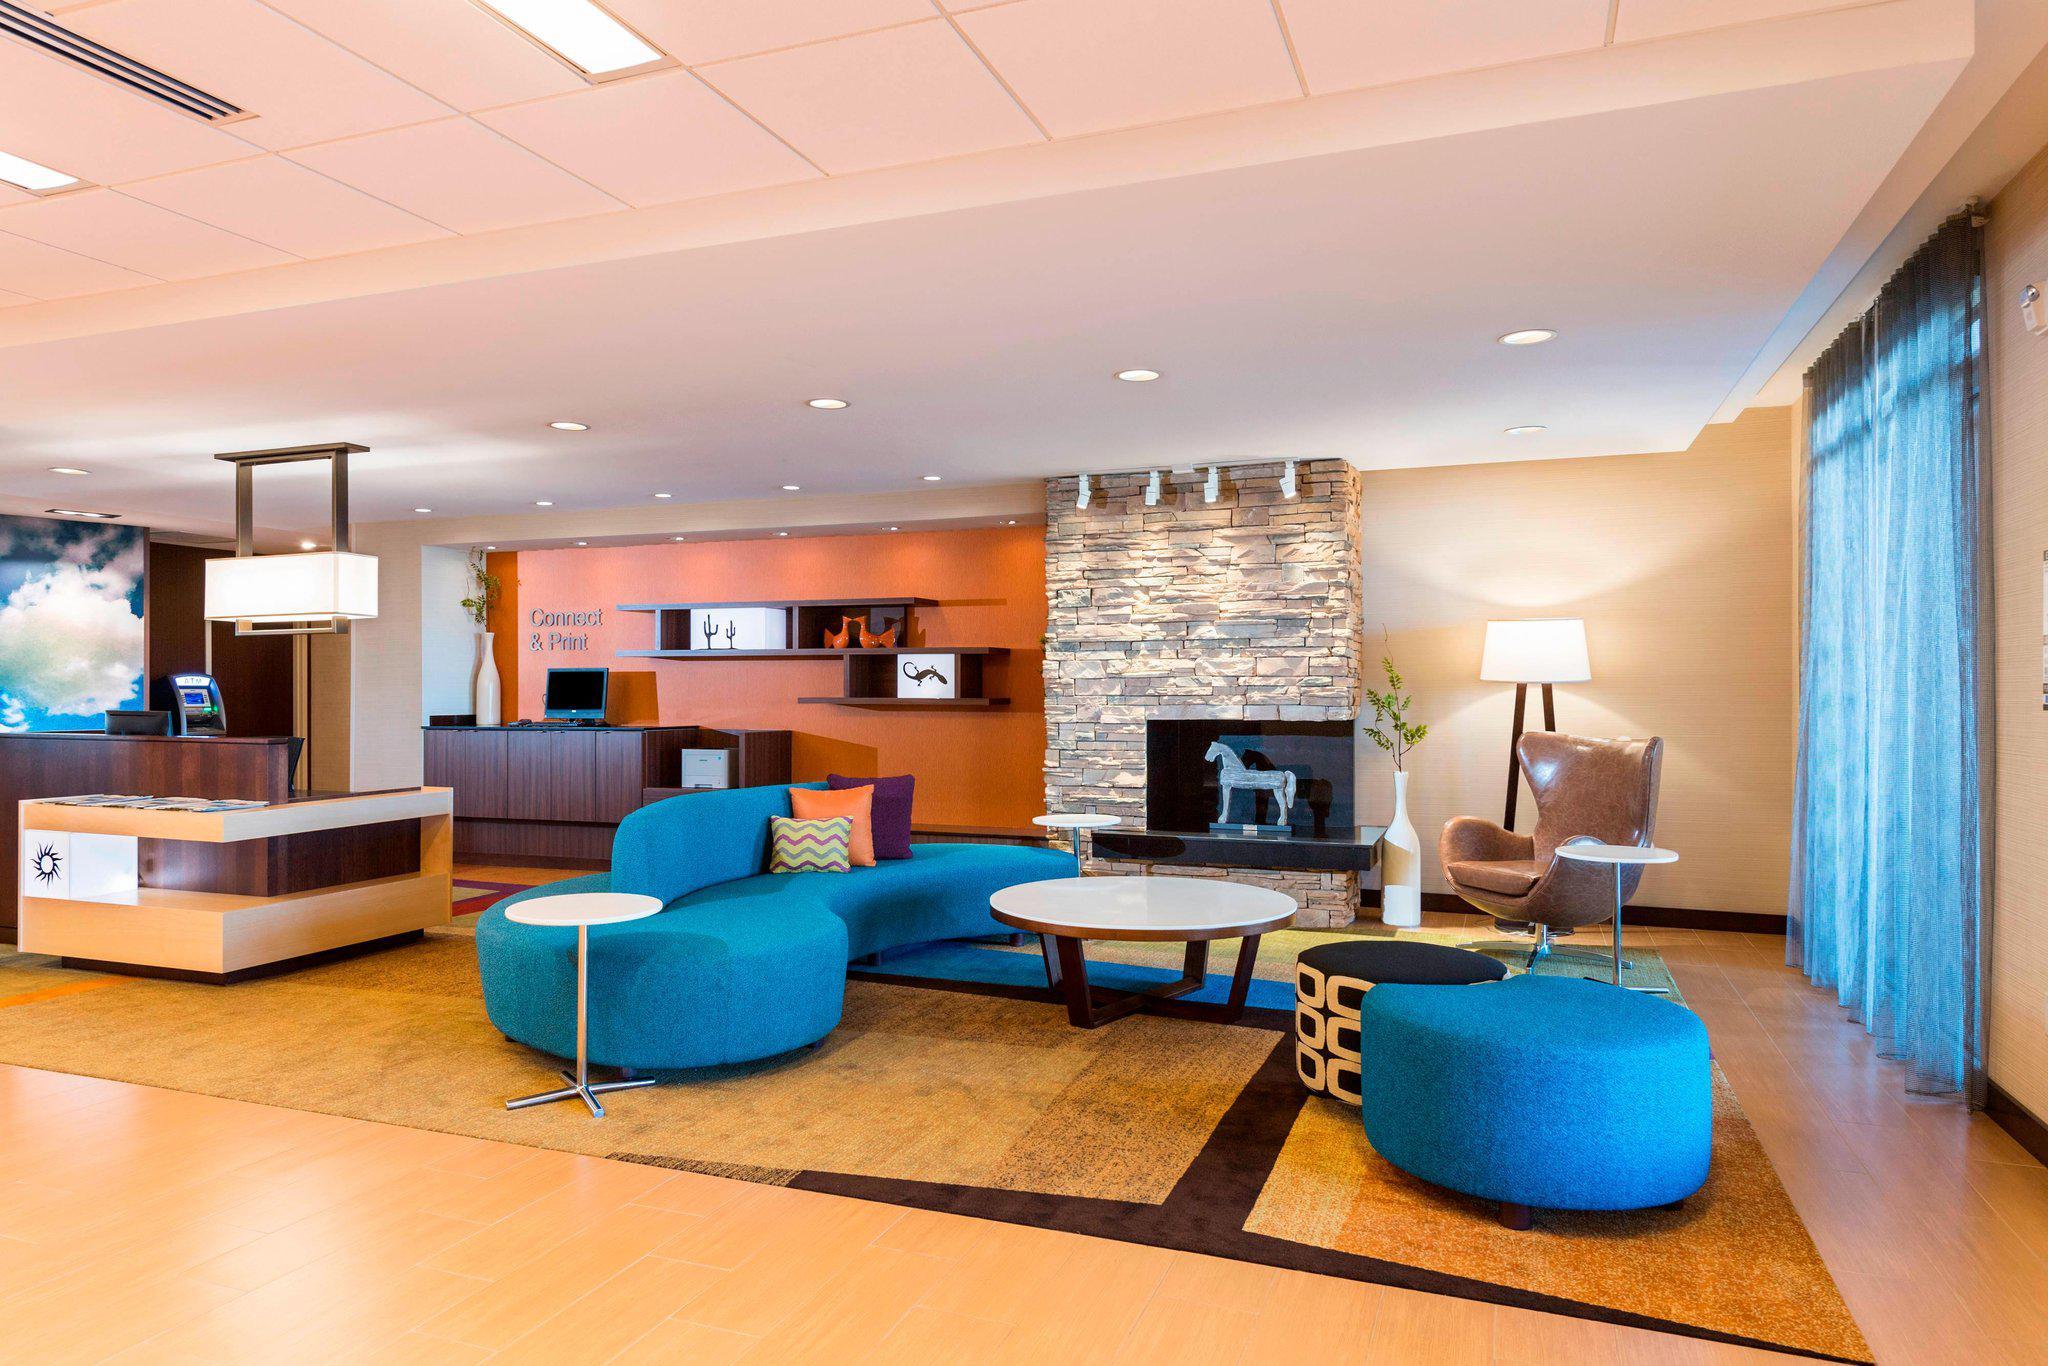 Fairfield Inn & Suites by Marriott Palm Desert